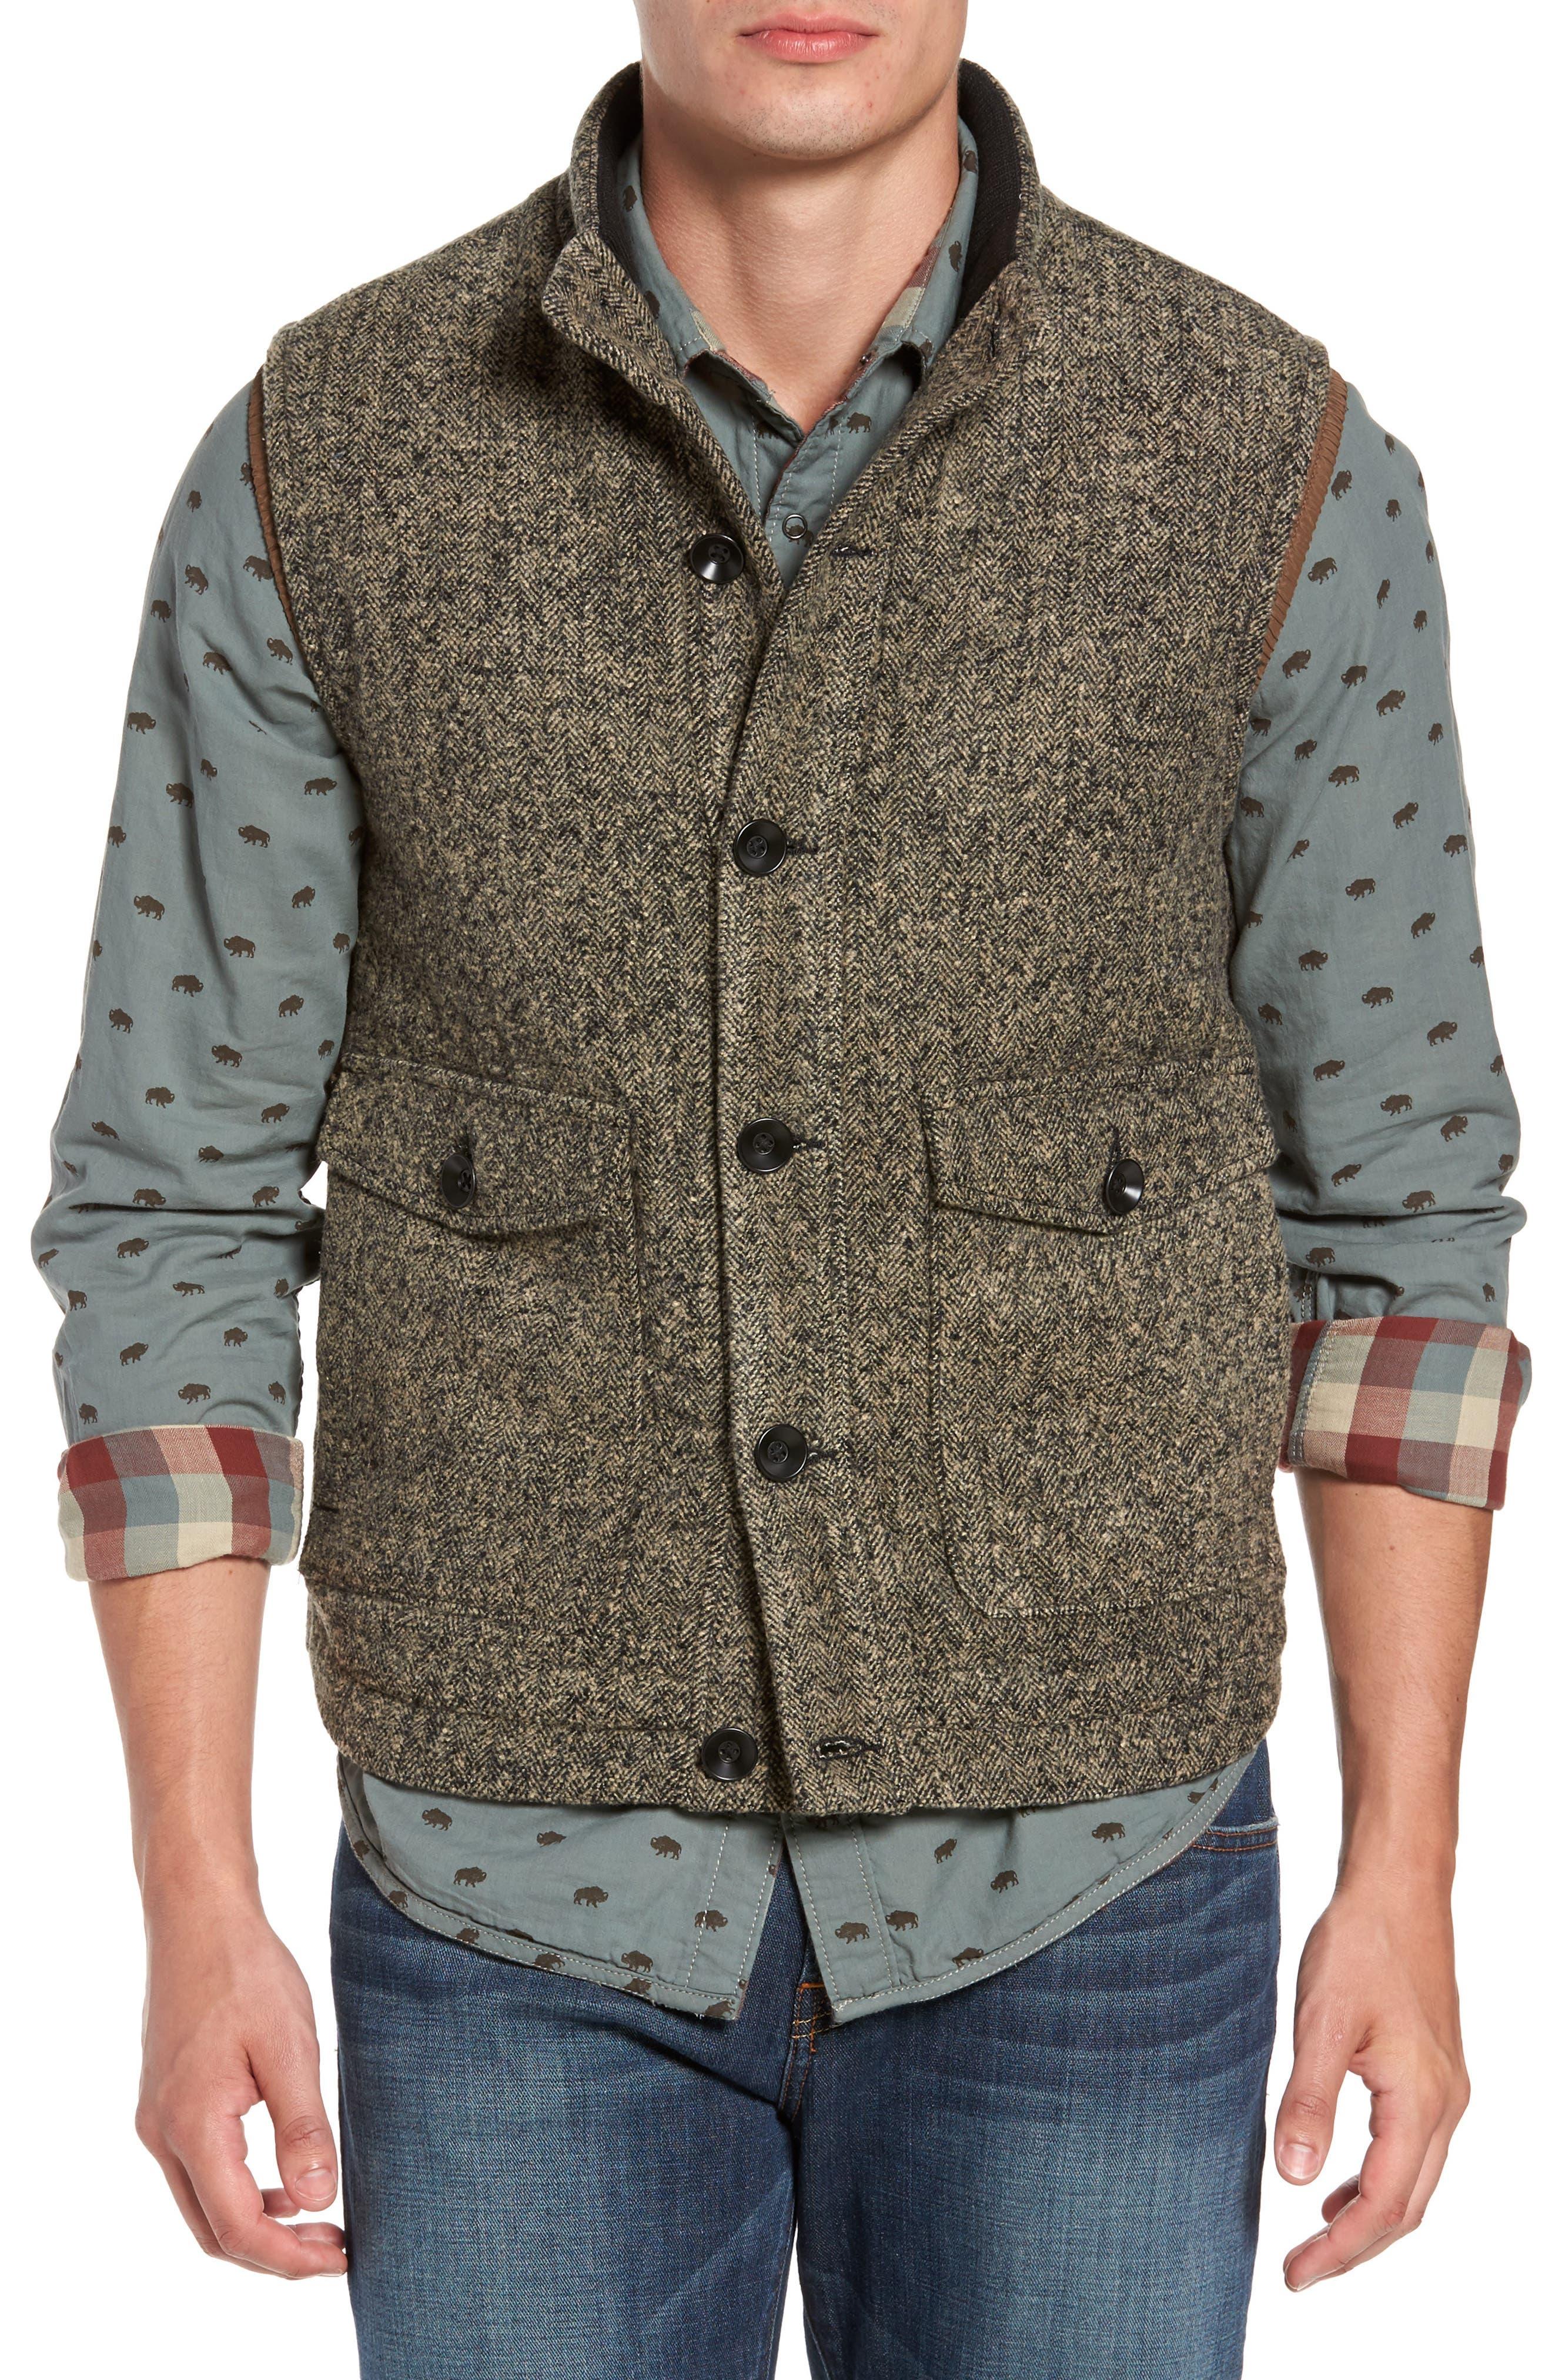 Sanford Herringbone Vest,                         Main,                         color, Mule Heather